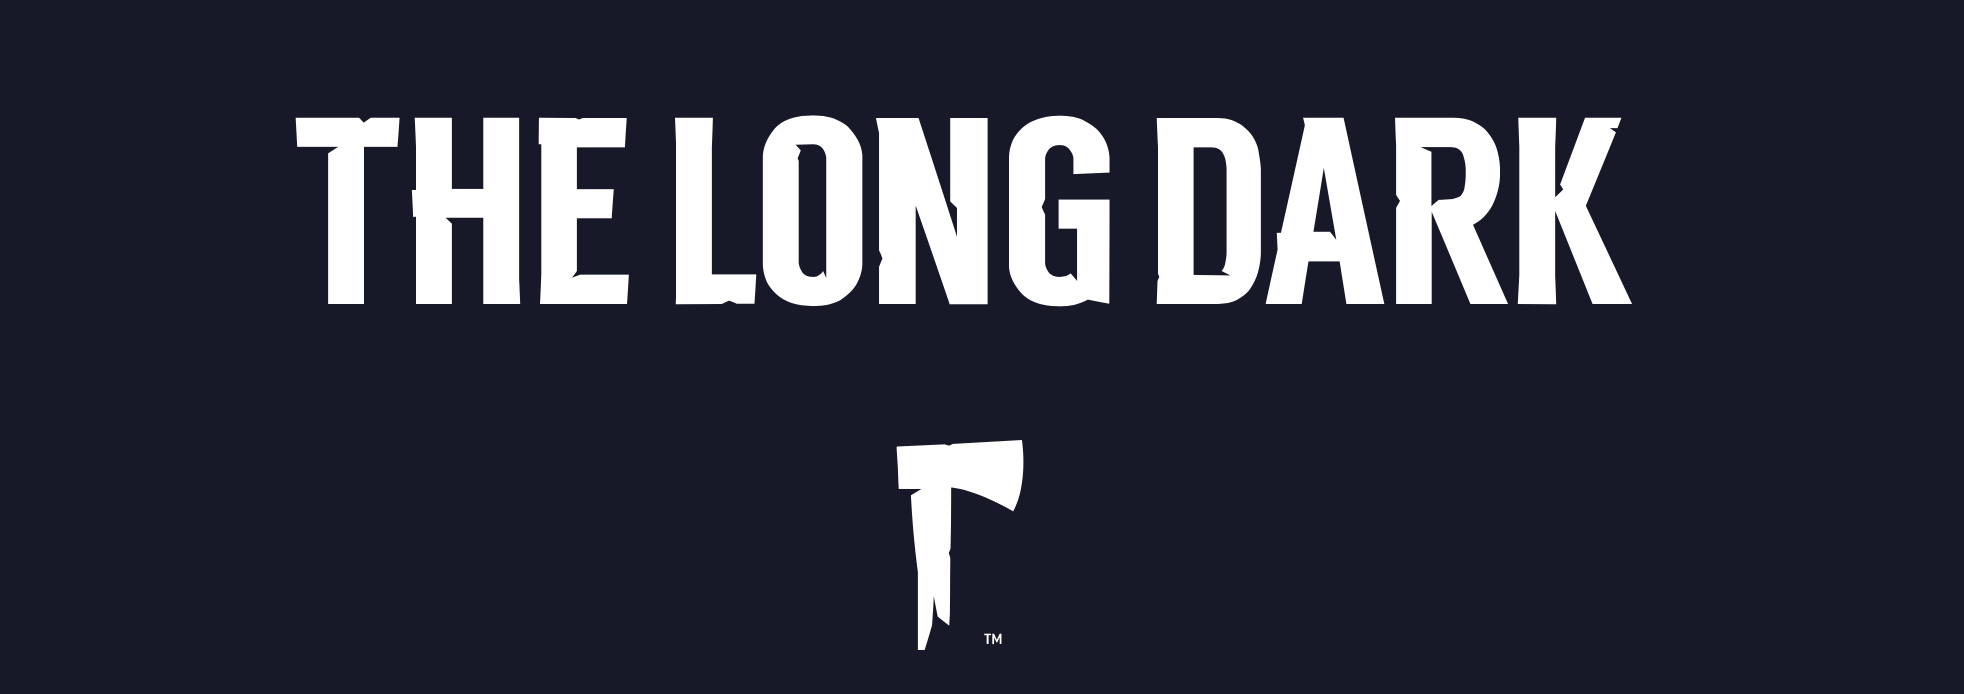 The Long Dark tuxdbcom